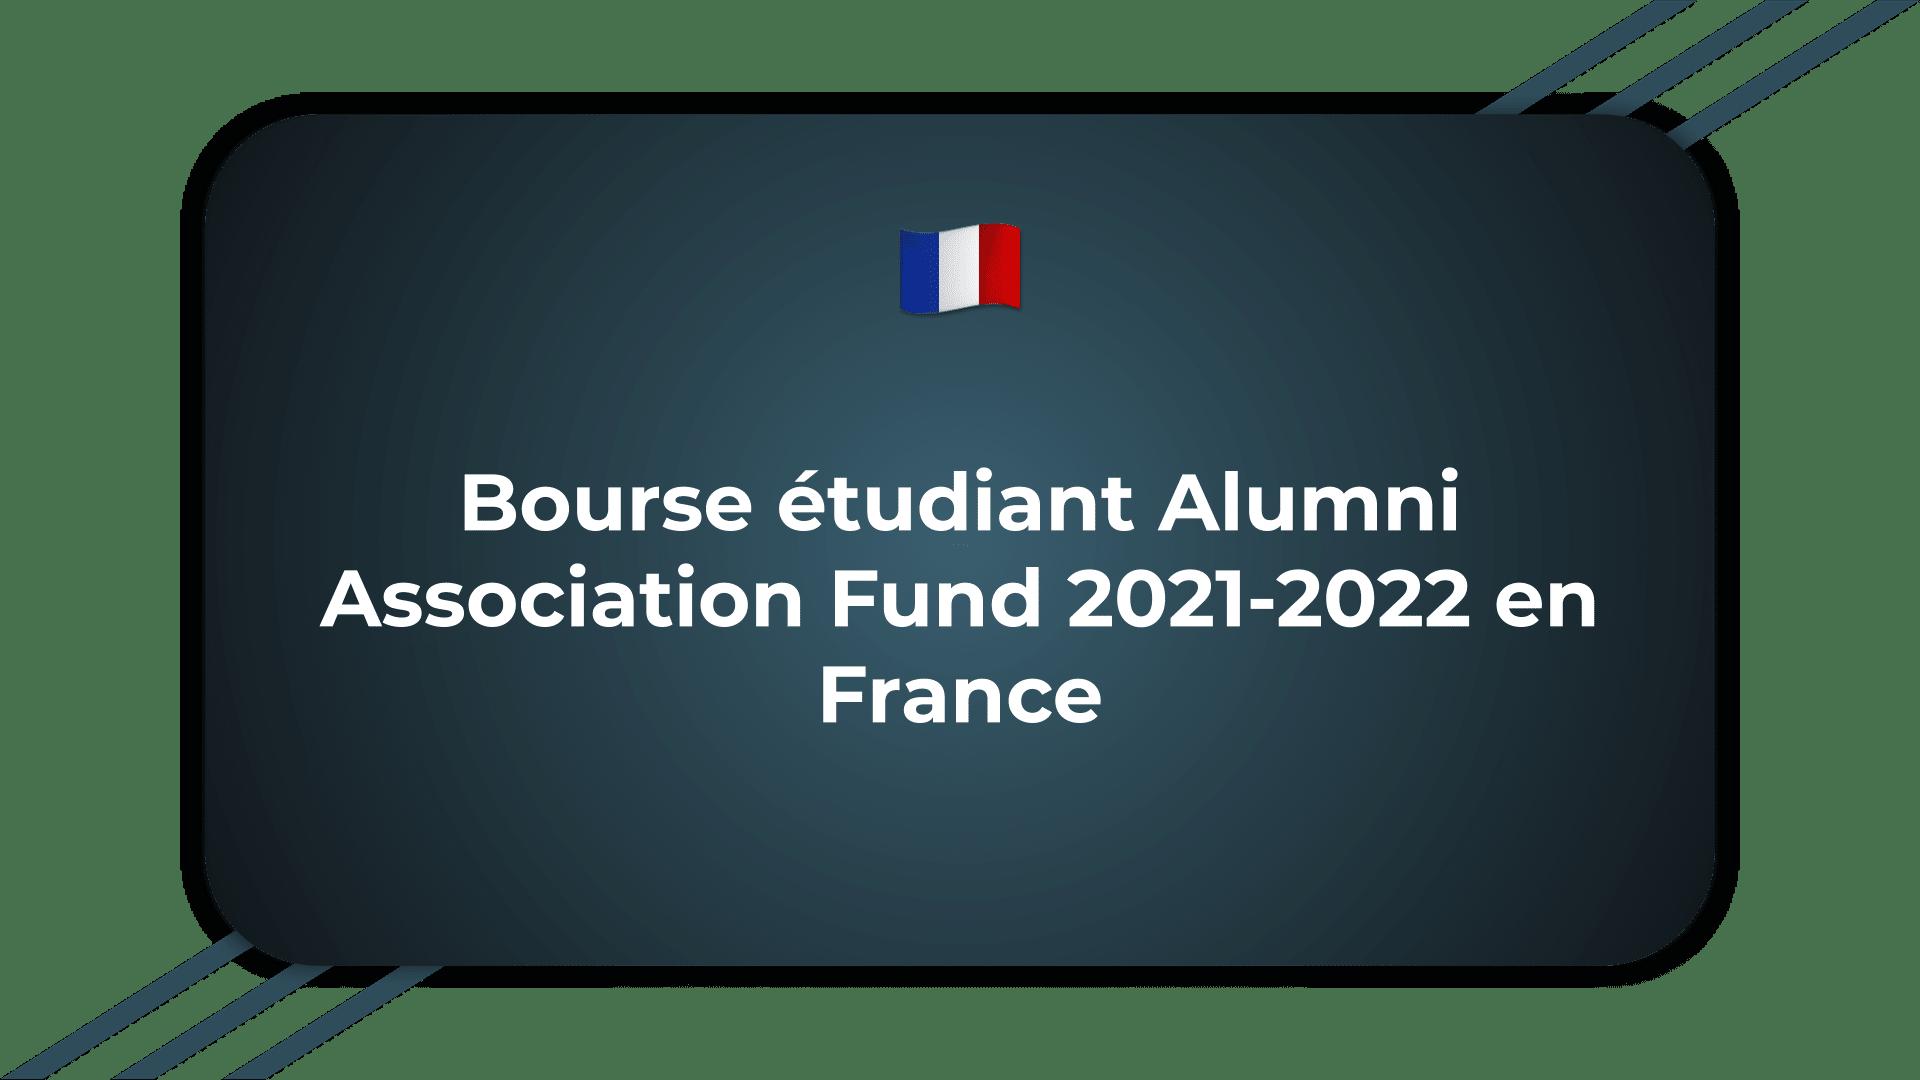 Bourse étudiant Alumni Association Fund